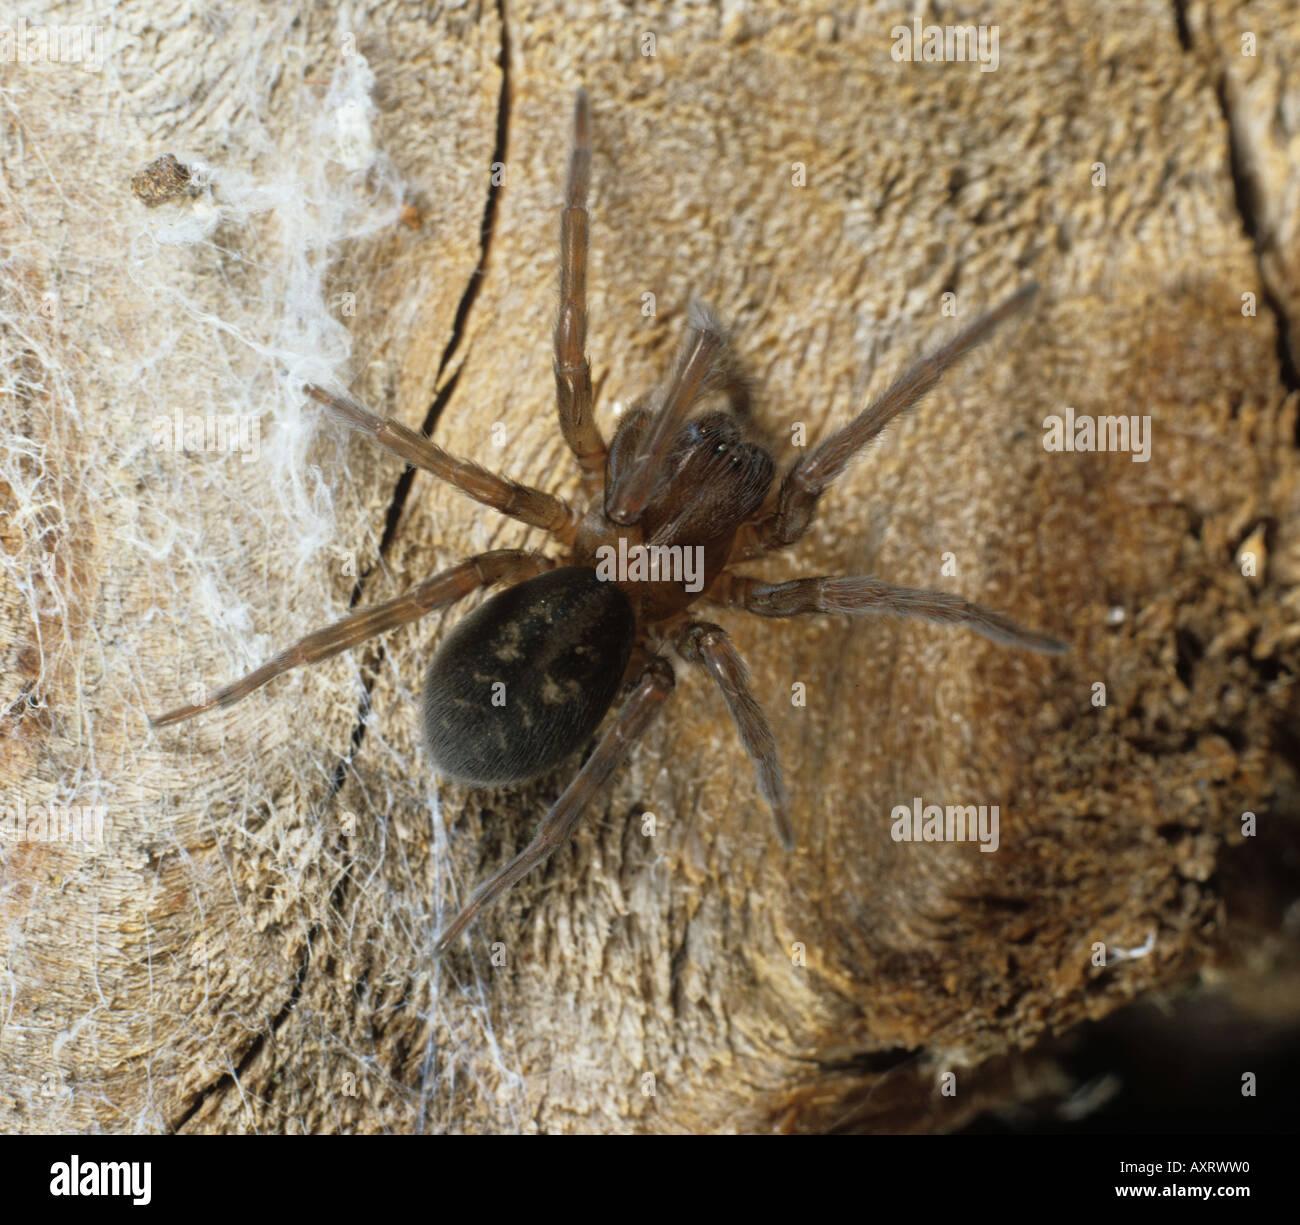 Adult lace web spider Amaurobius ferox female - Stock Image